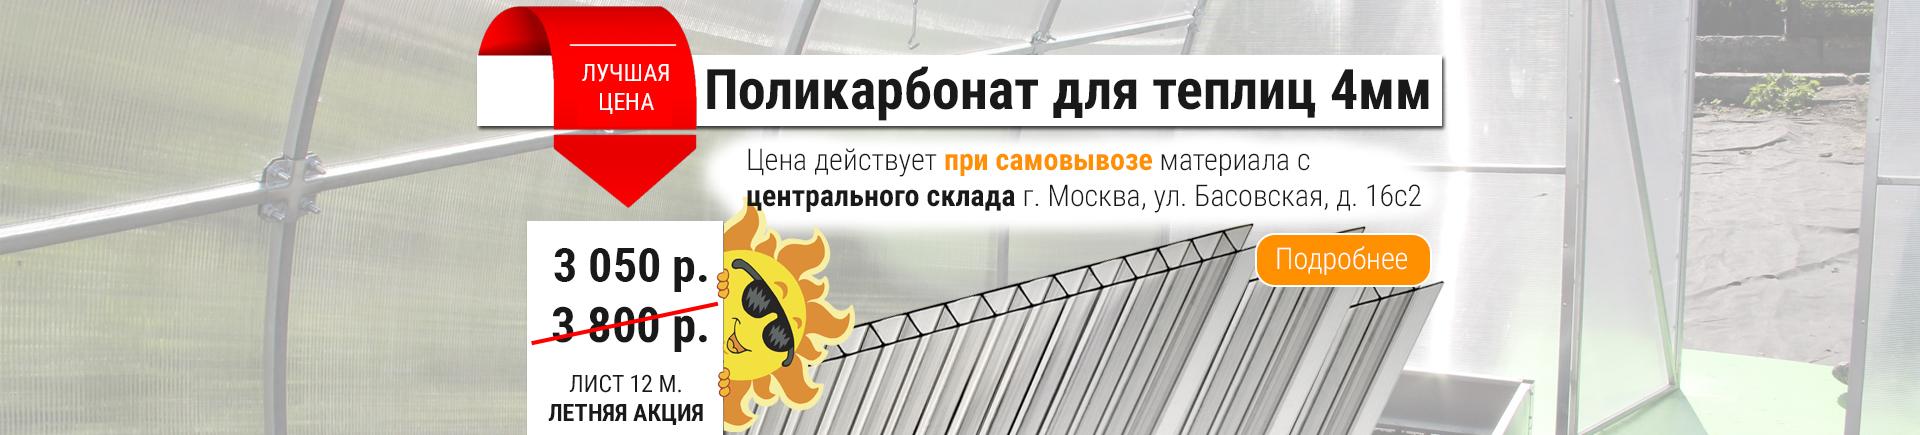 Поликарбонат для теплиц по акции лето 2019